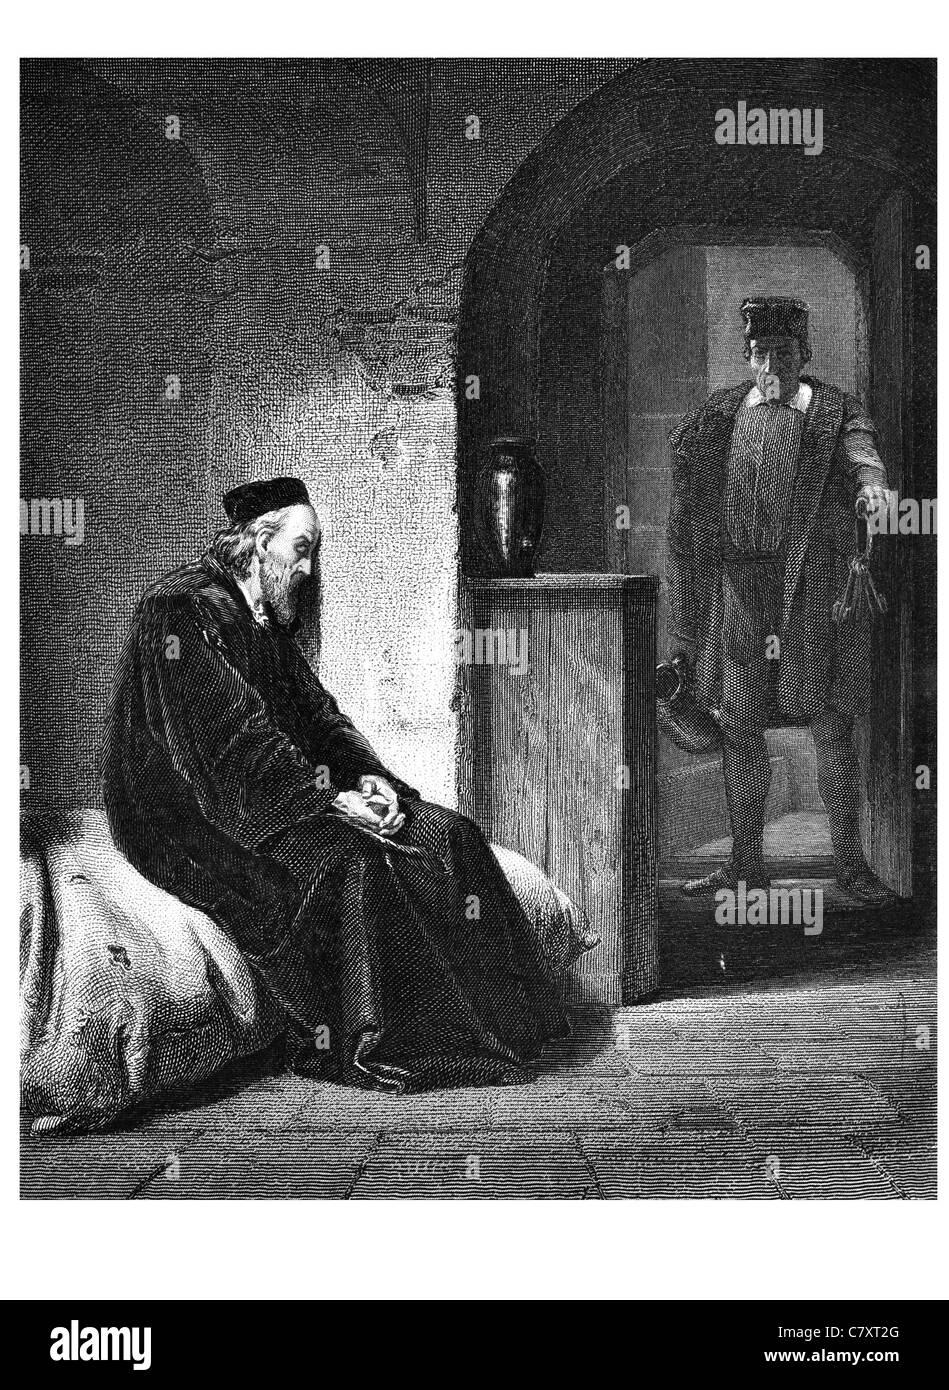 Sir Thomas More 1478 1535 English lawyer author statesman Renaissance humanist scholar Lord Chancellor - Stock Image